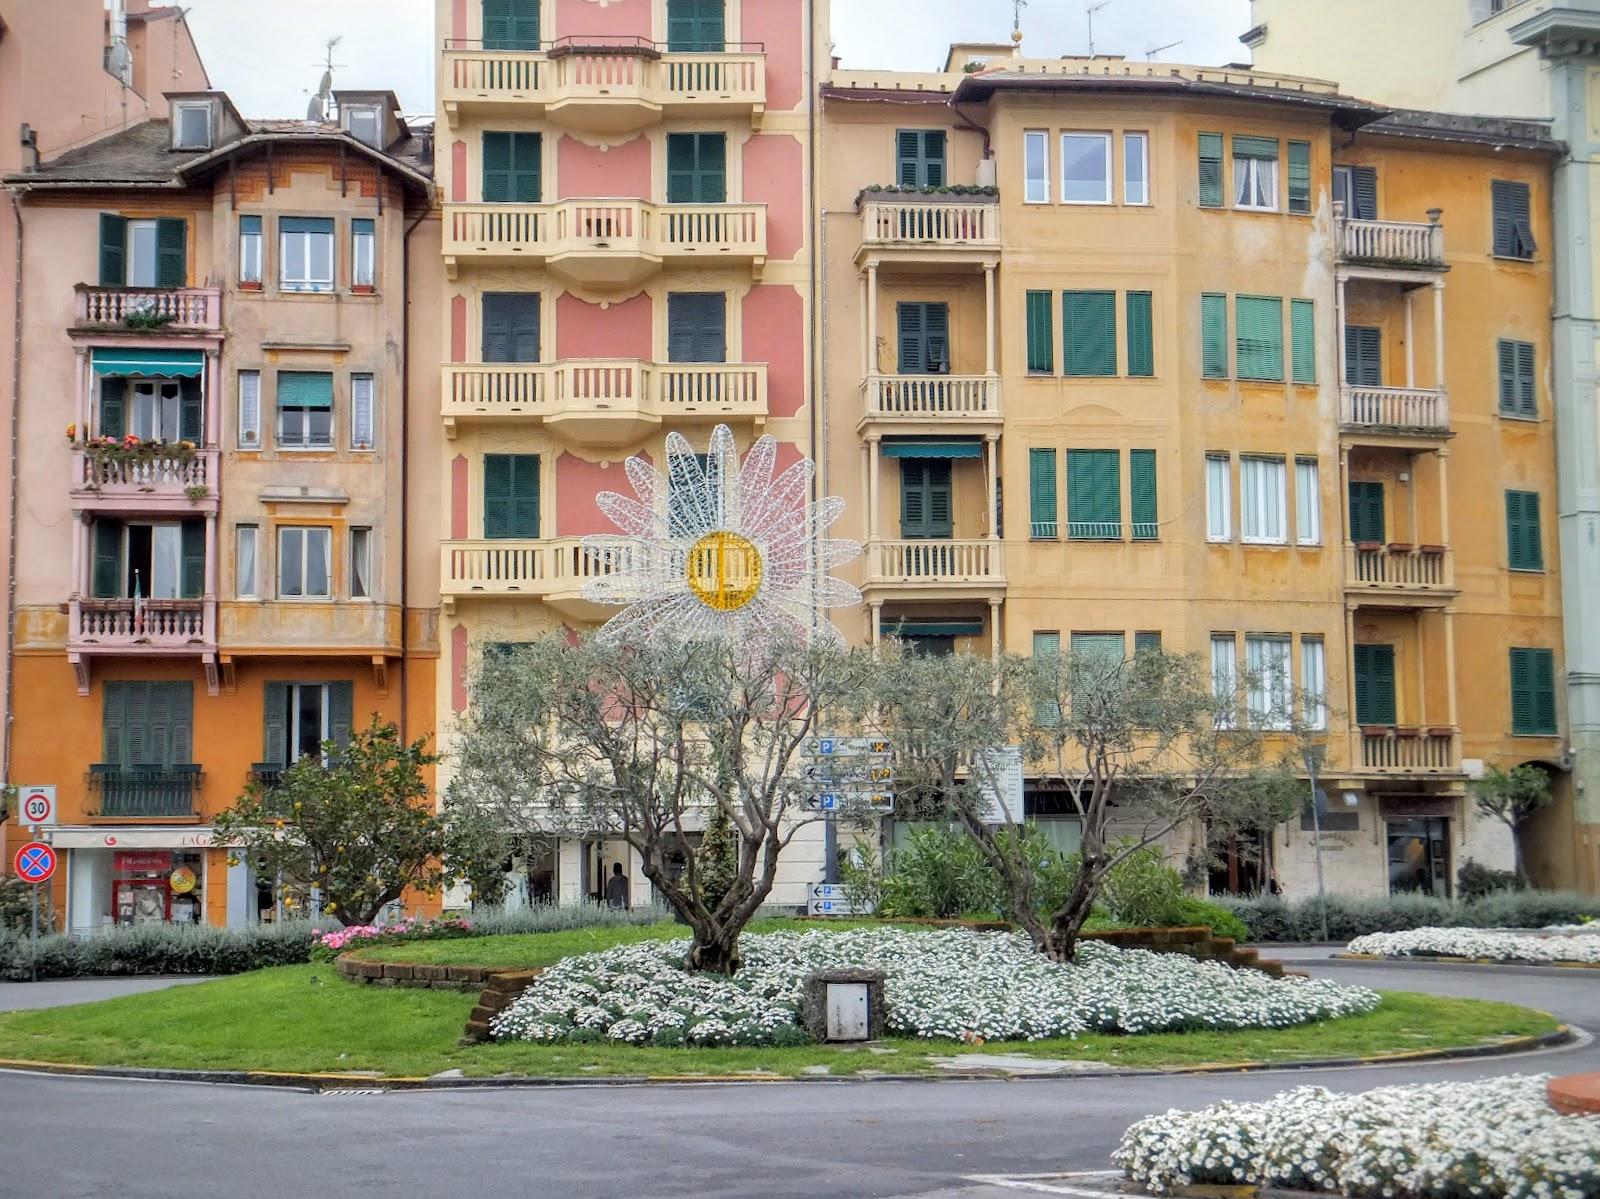 Santa Margherita Ligure, Italia, Elisa N, Blog de Viajes, Lifestyle, Travel